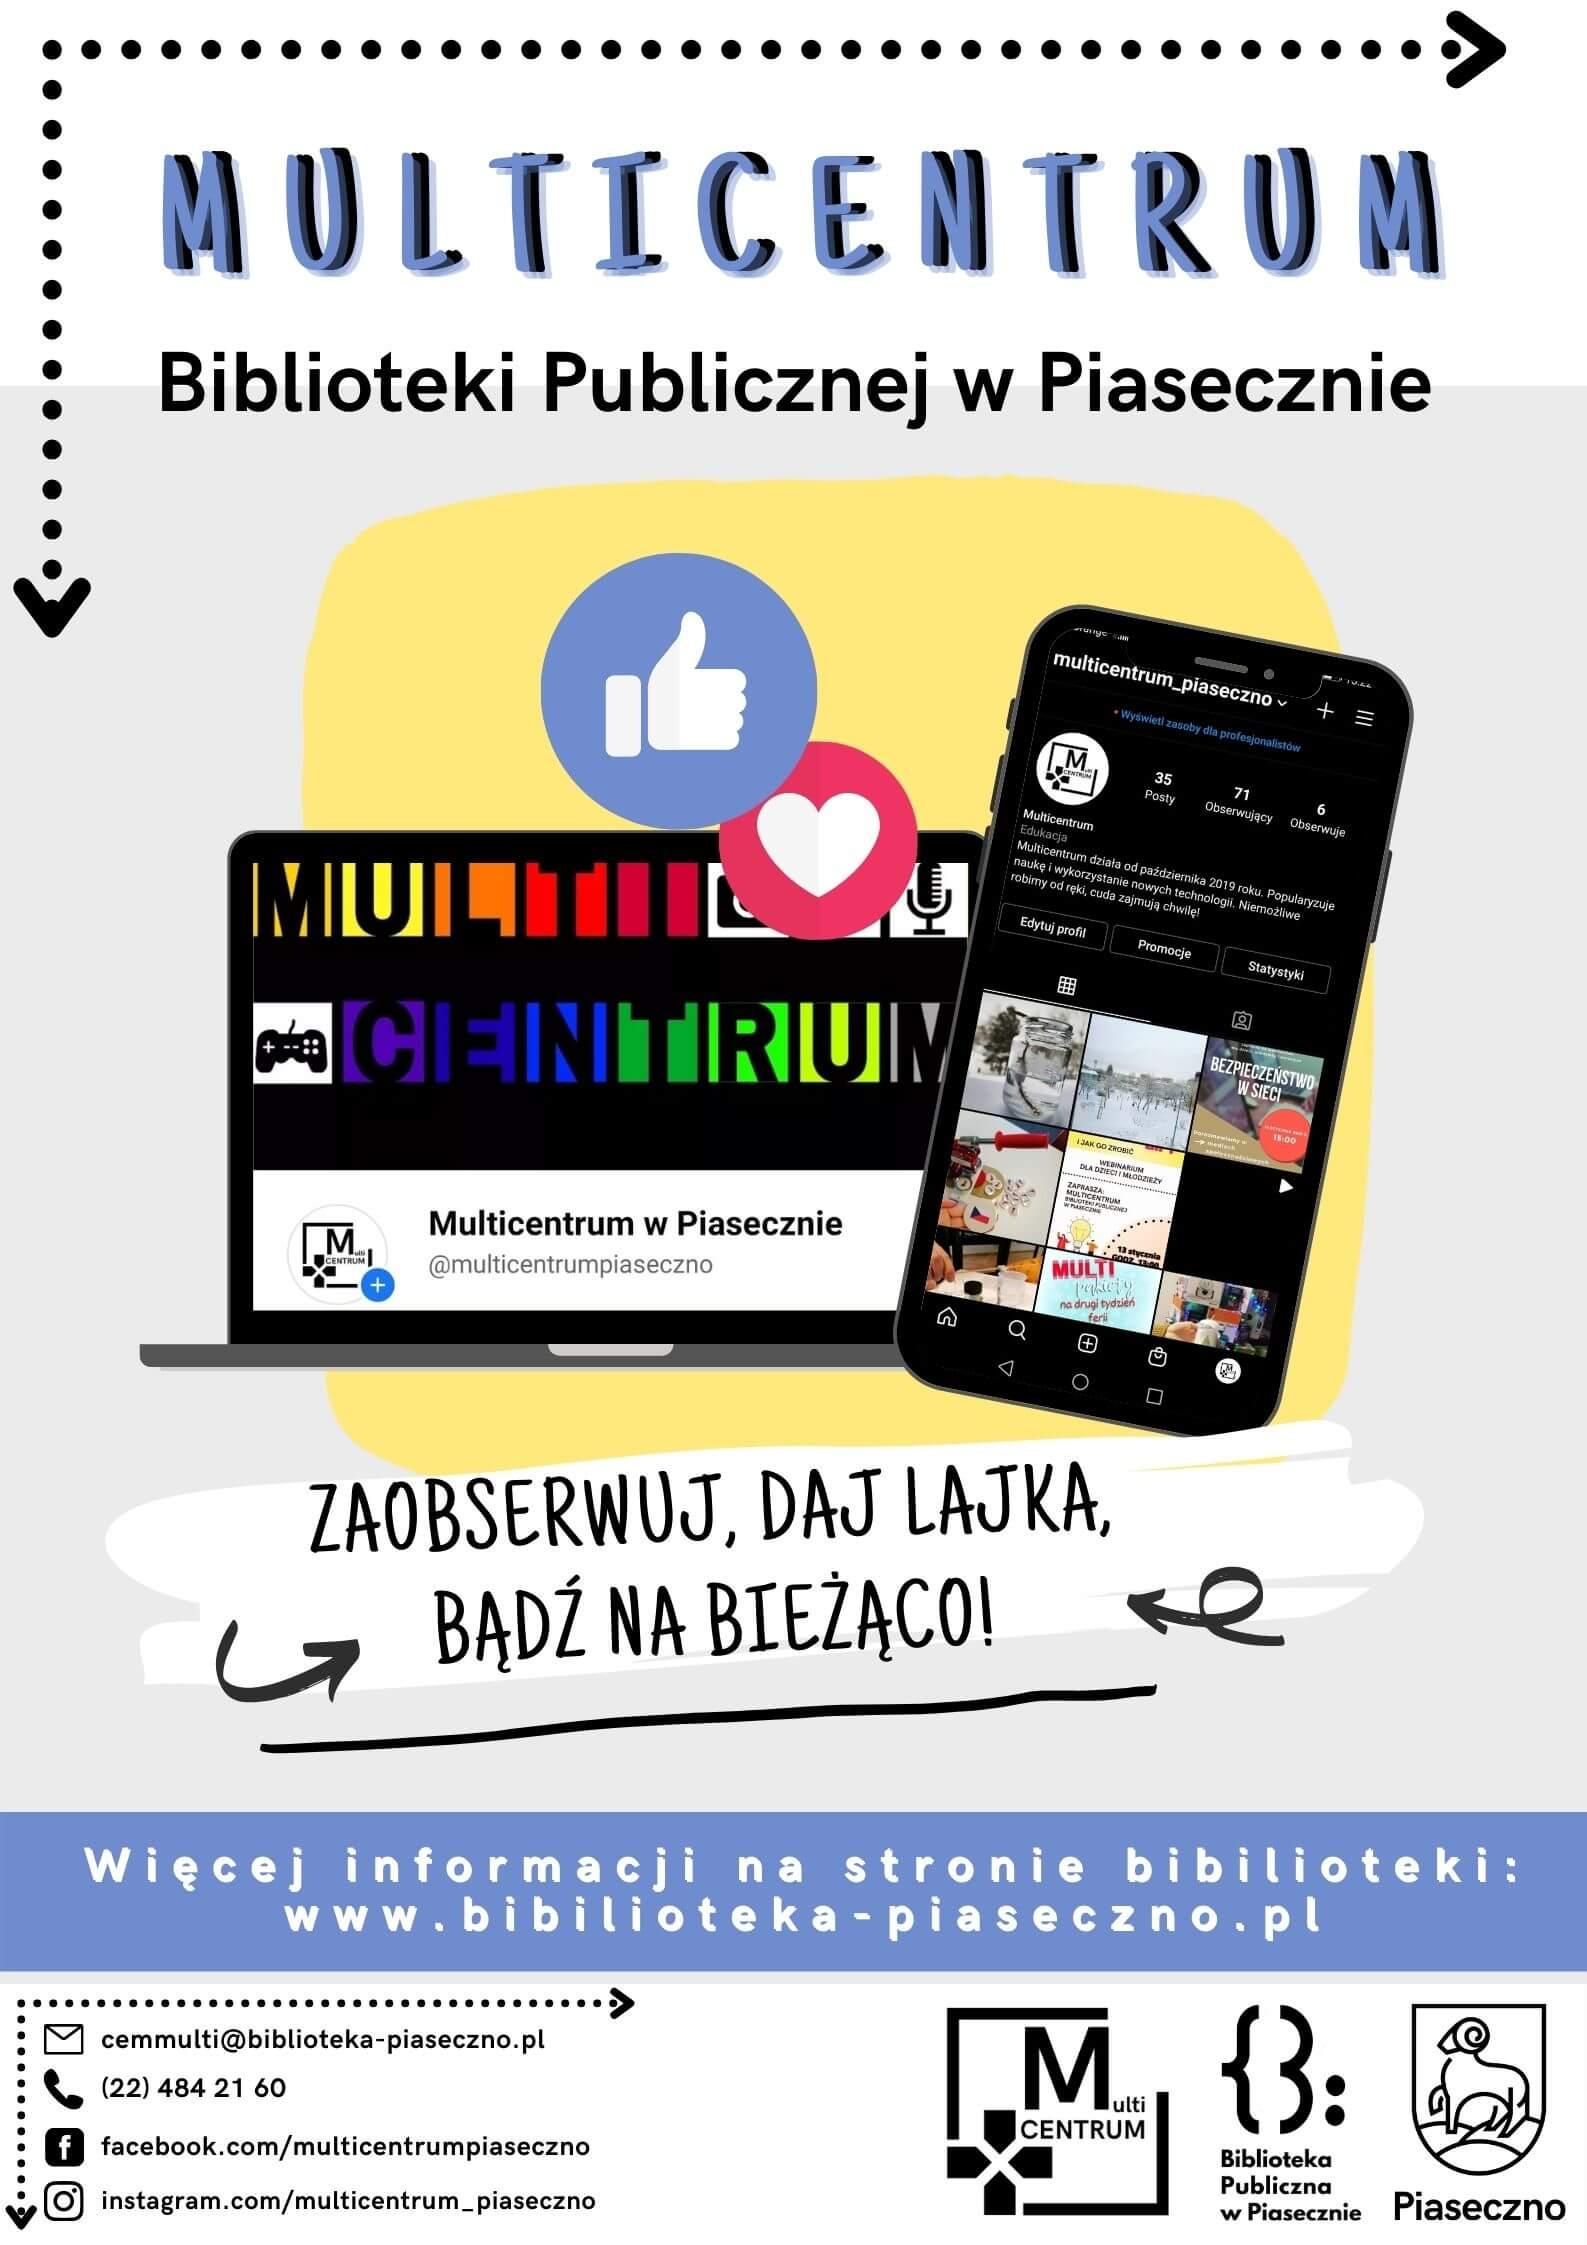 Plakat promujący media społecznościowe Multicentrum